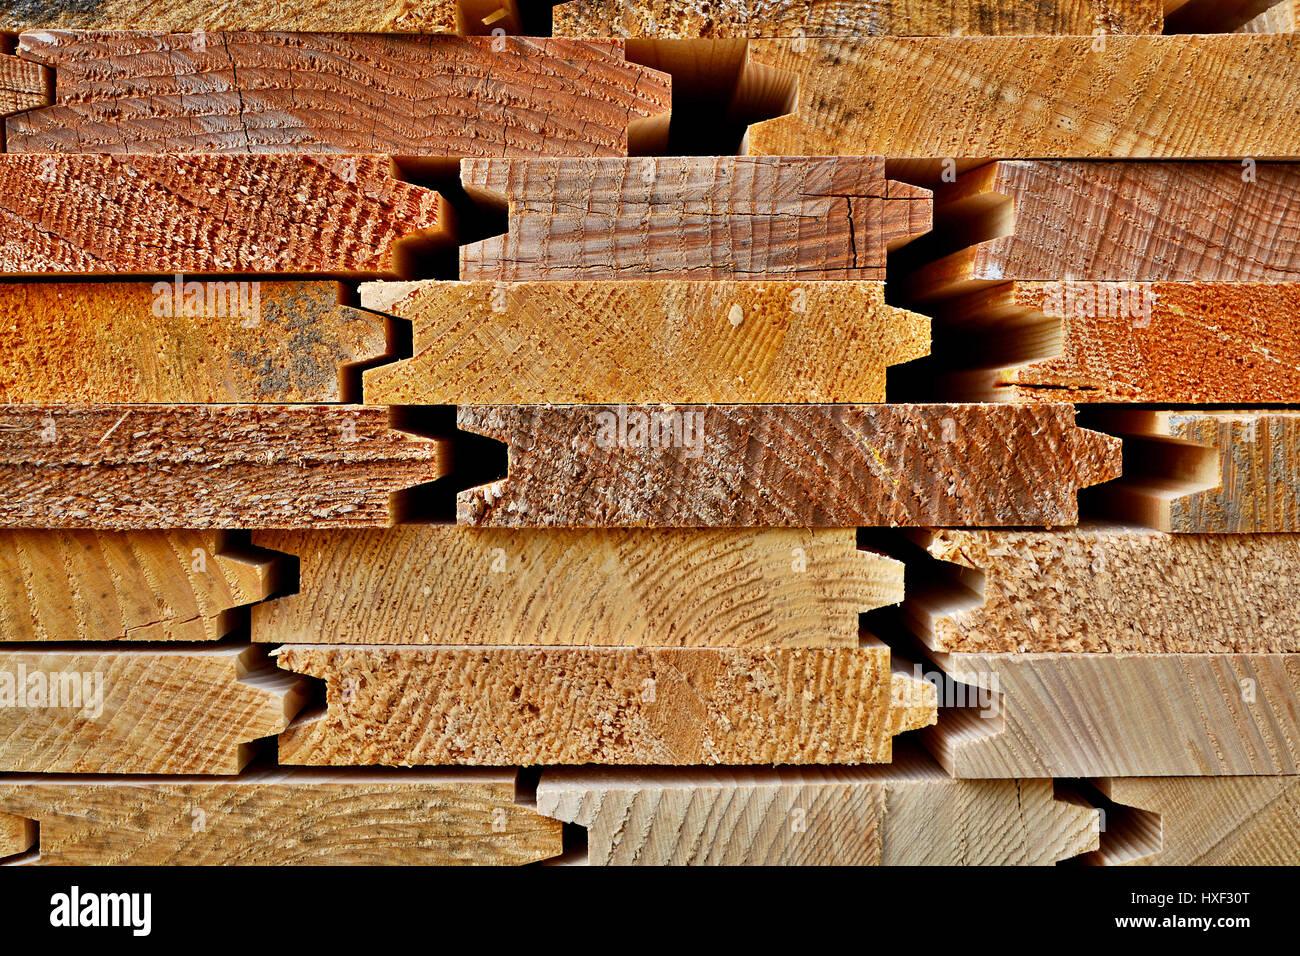 Close Up Of Horizontally Stacked Wood Planks - Stock Image